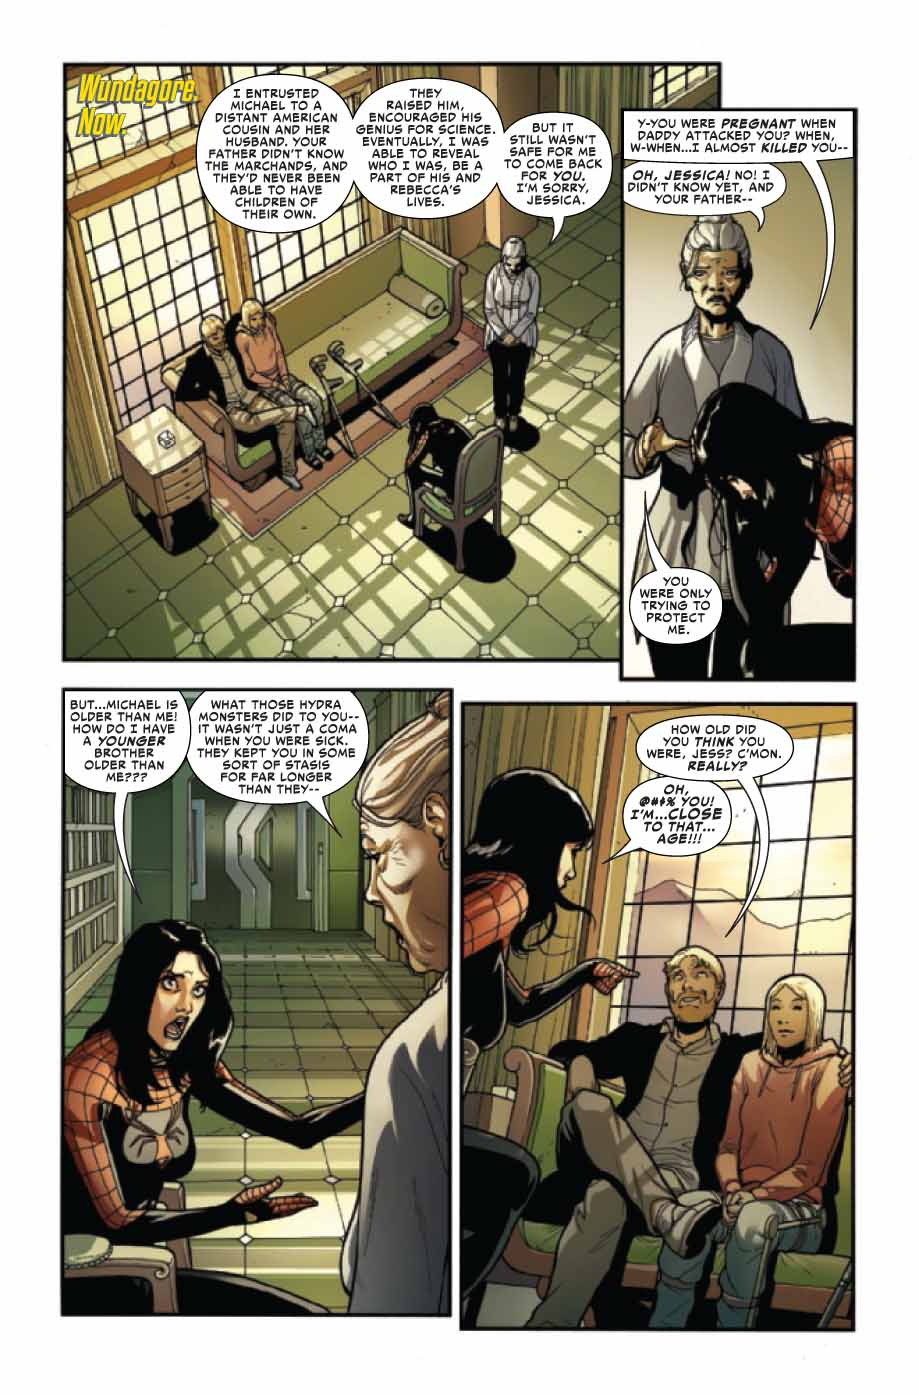 spiderwoman43